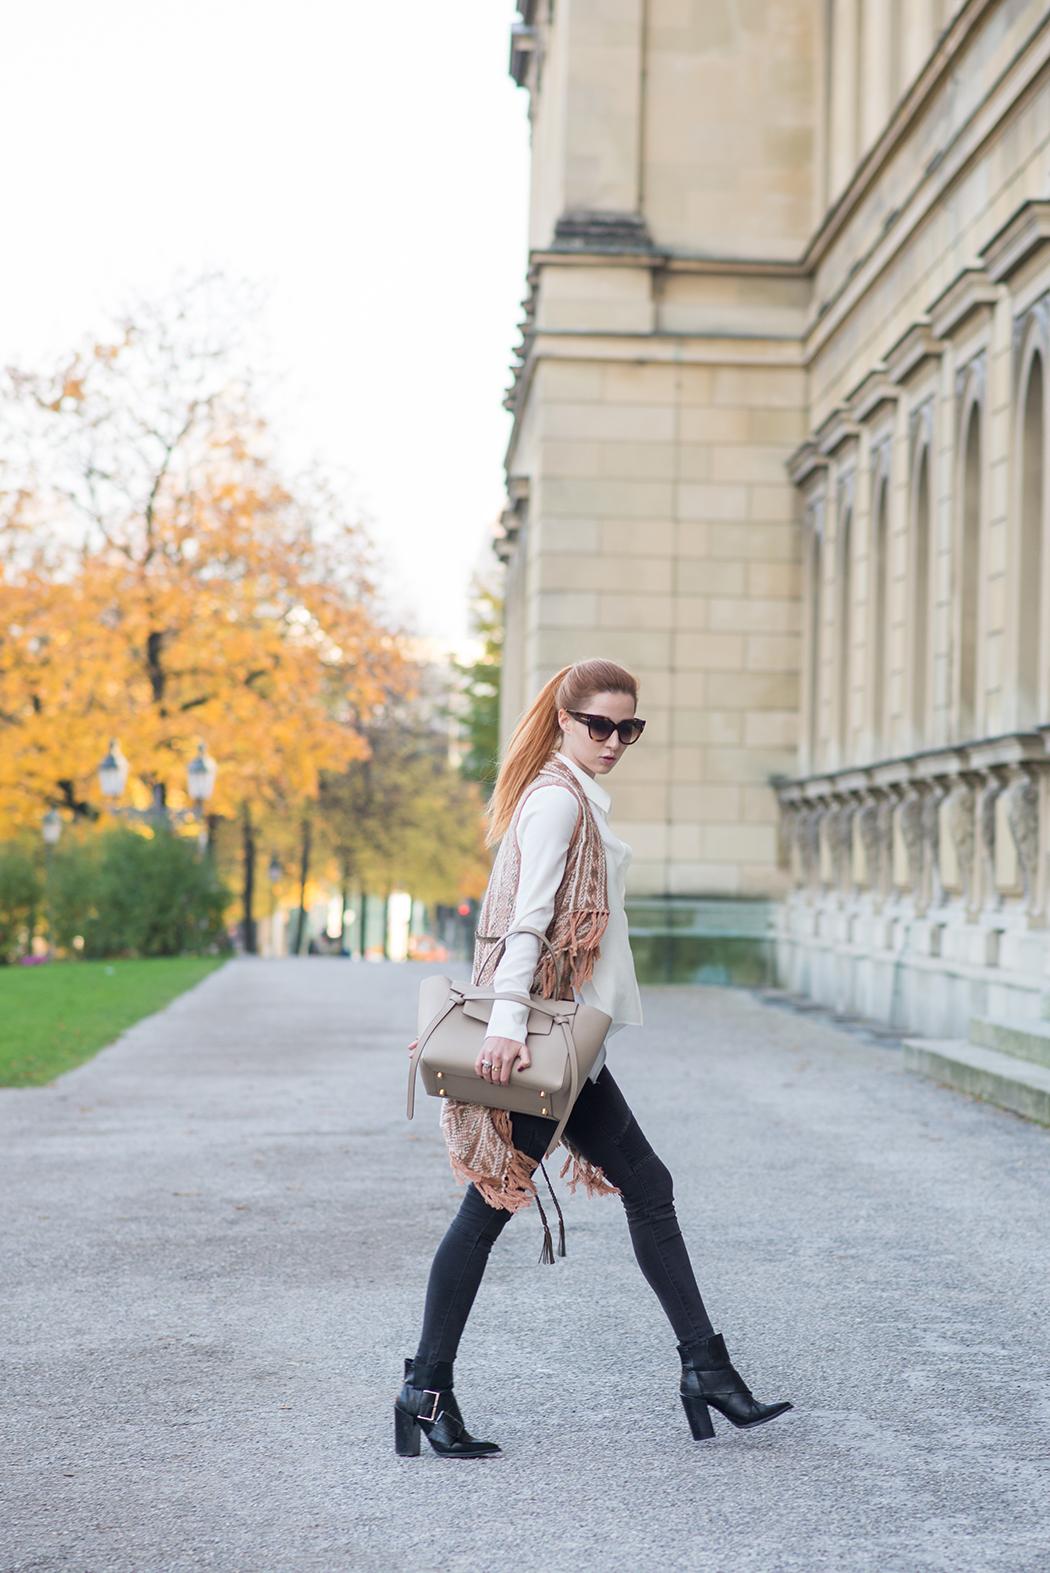 Fashionblog-Fashionblogger-Fashion-Blog-Blogger-Lifestyle-Céline_Belt_Bag-beige-REVIEW-Tom-Ford-Sonnenbrille-Cateye-Lindarella-1-web